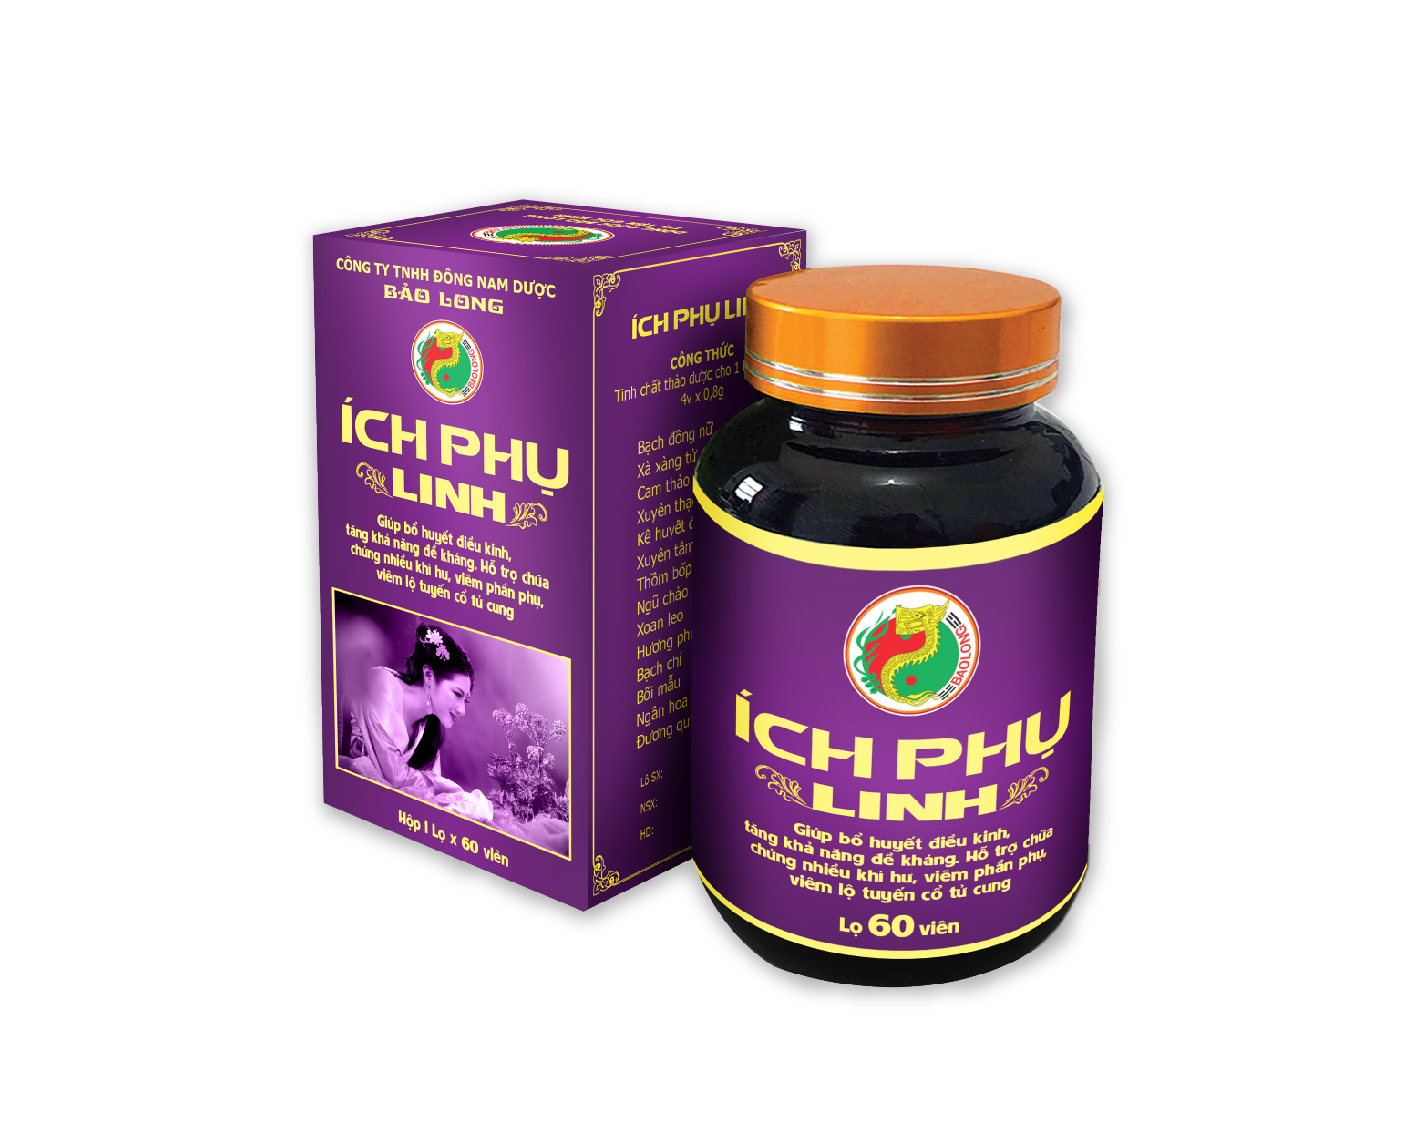 ich-phu-linh